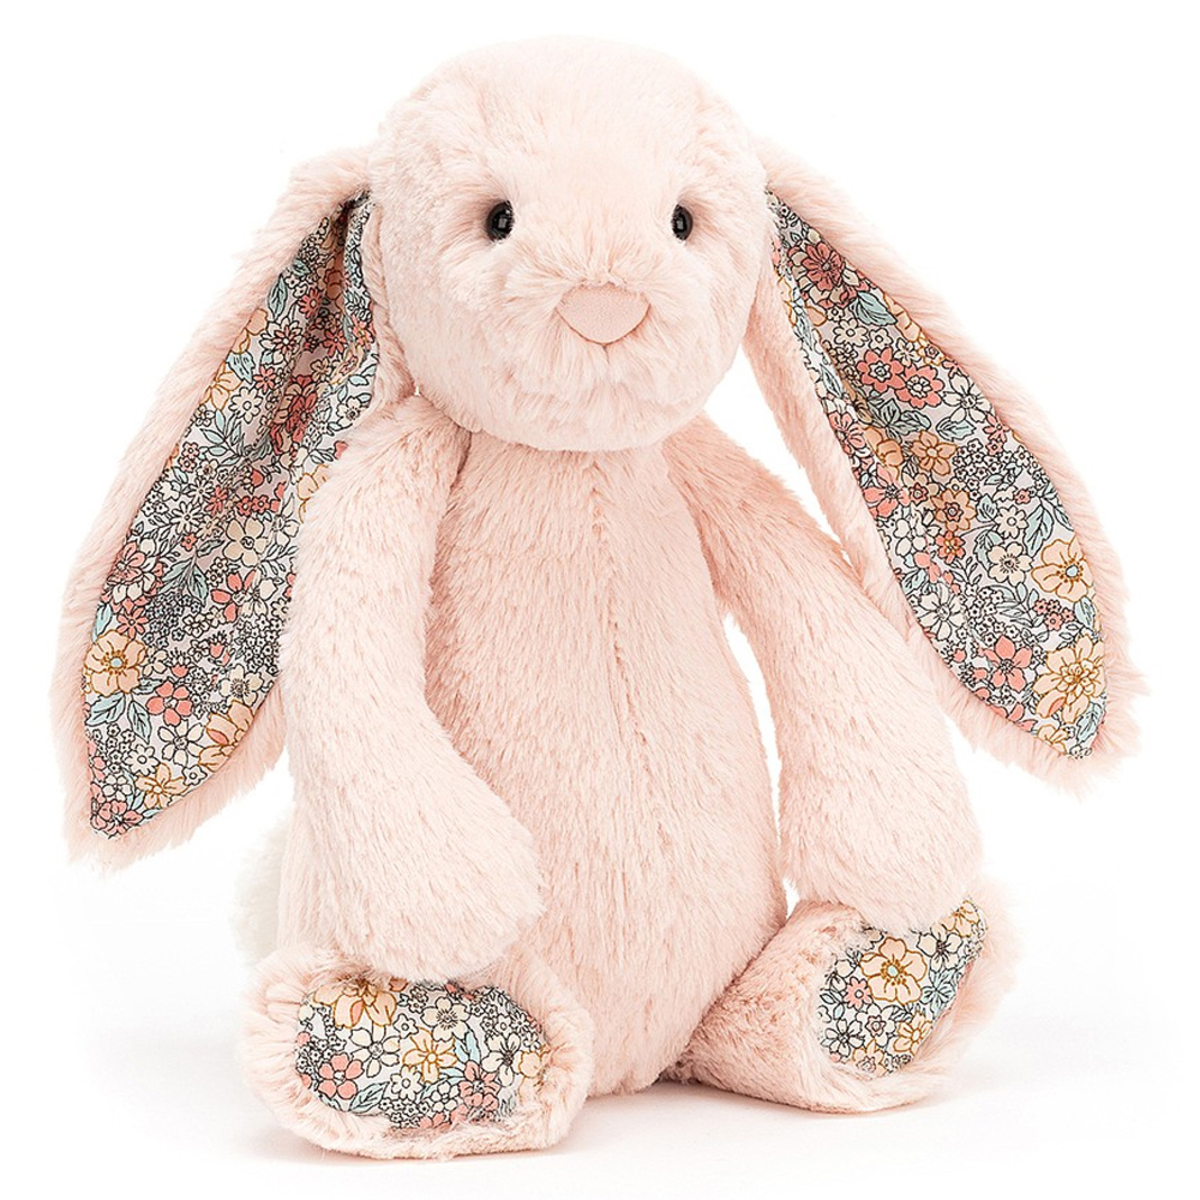 Peluche Blossom Blush Bunny - Medium Blossom Blush Bunny - Medium